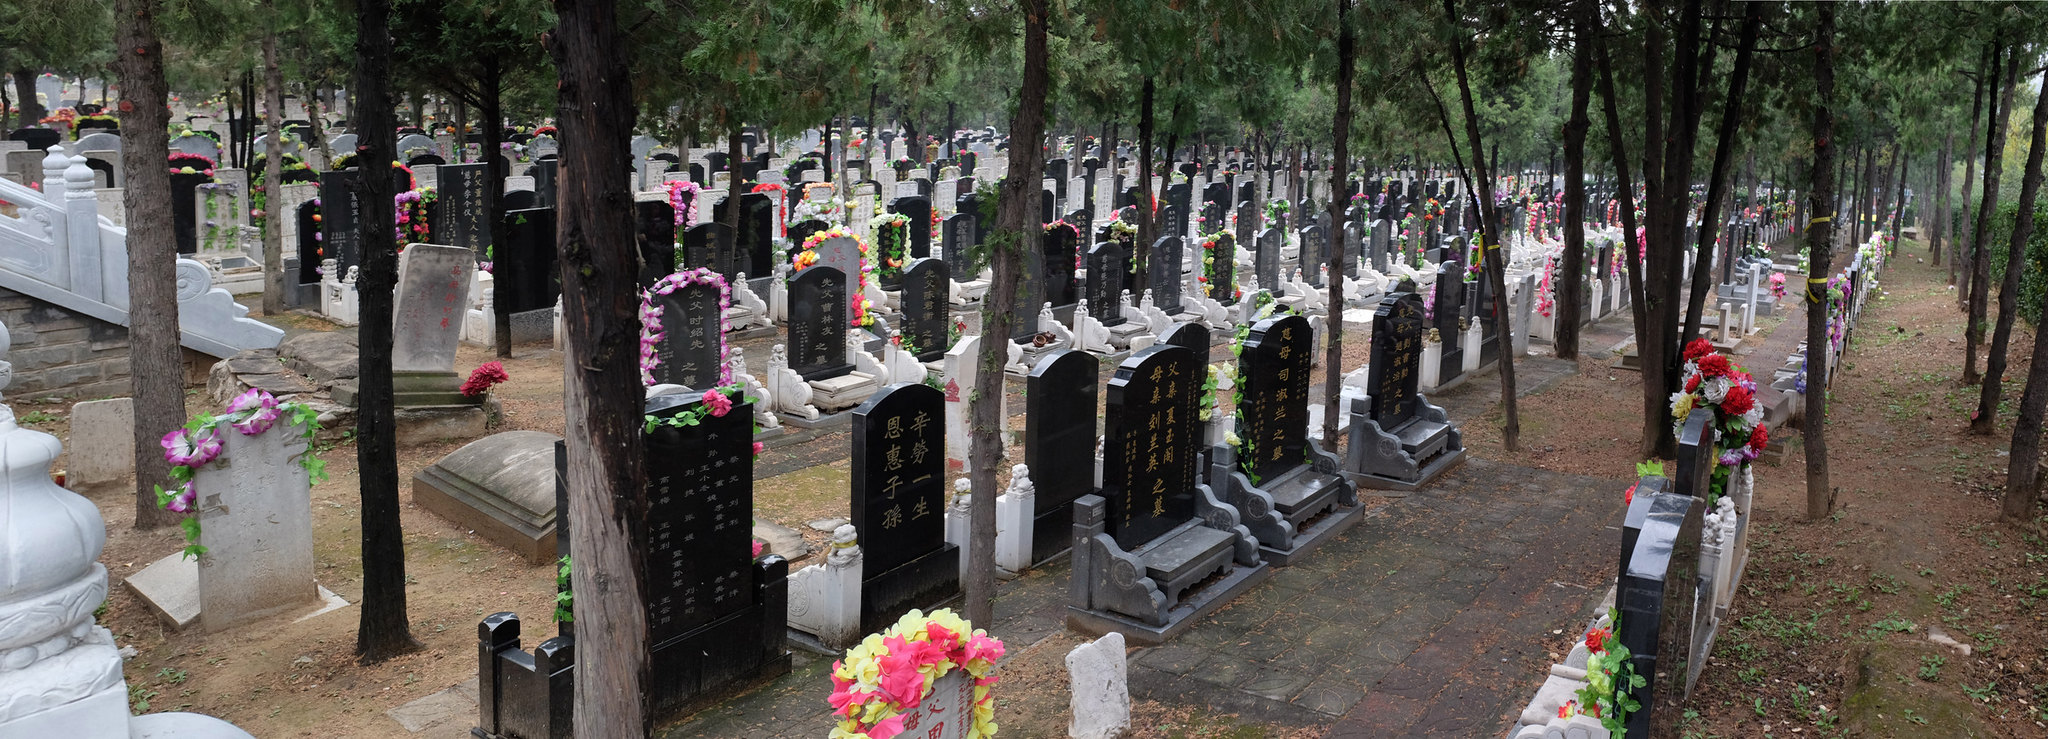 Beijinger Friedhof